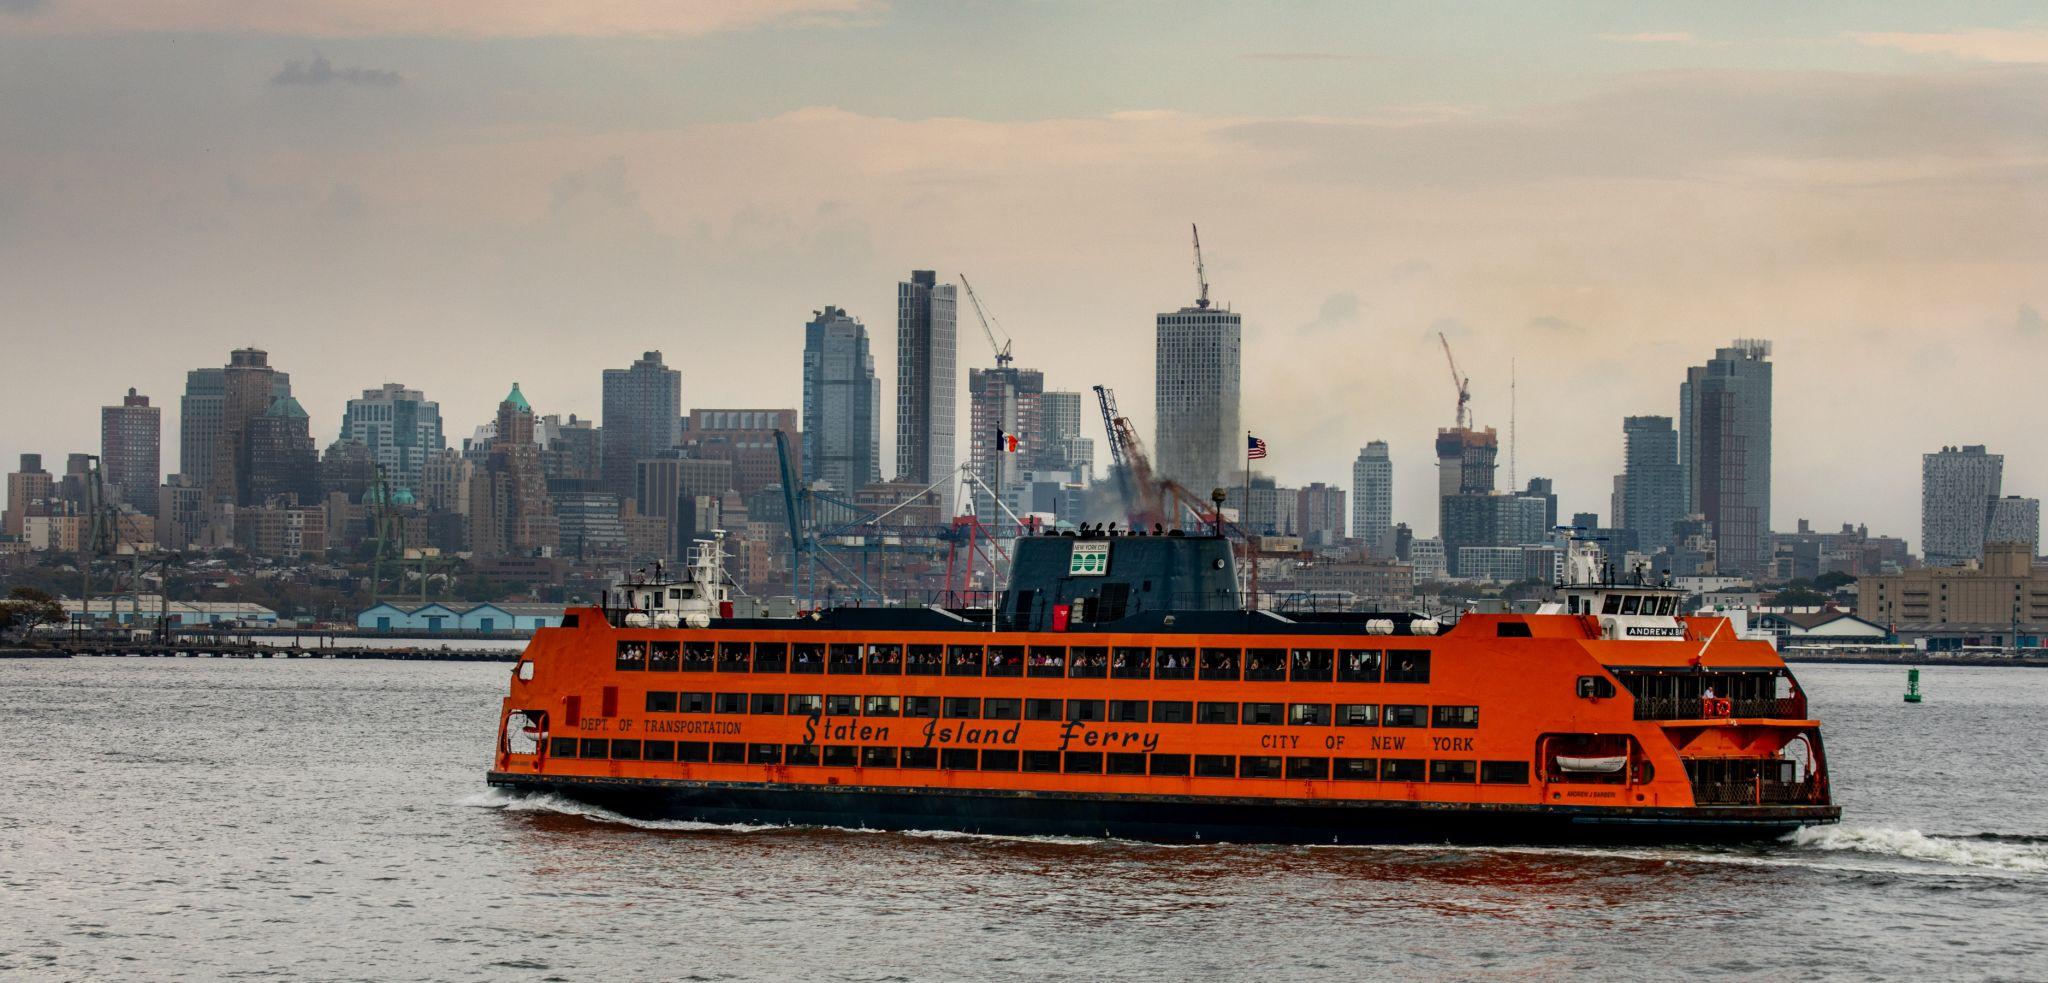 Staten Island Ferry from Lower Manhattan  New York, USA